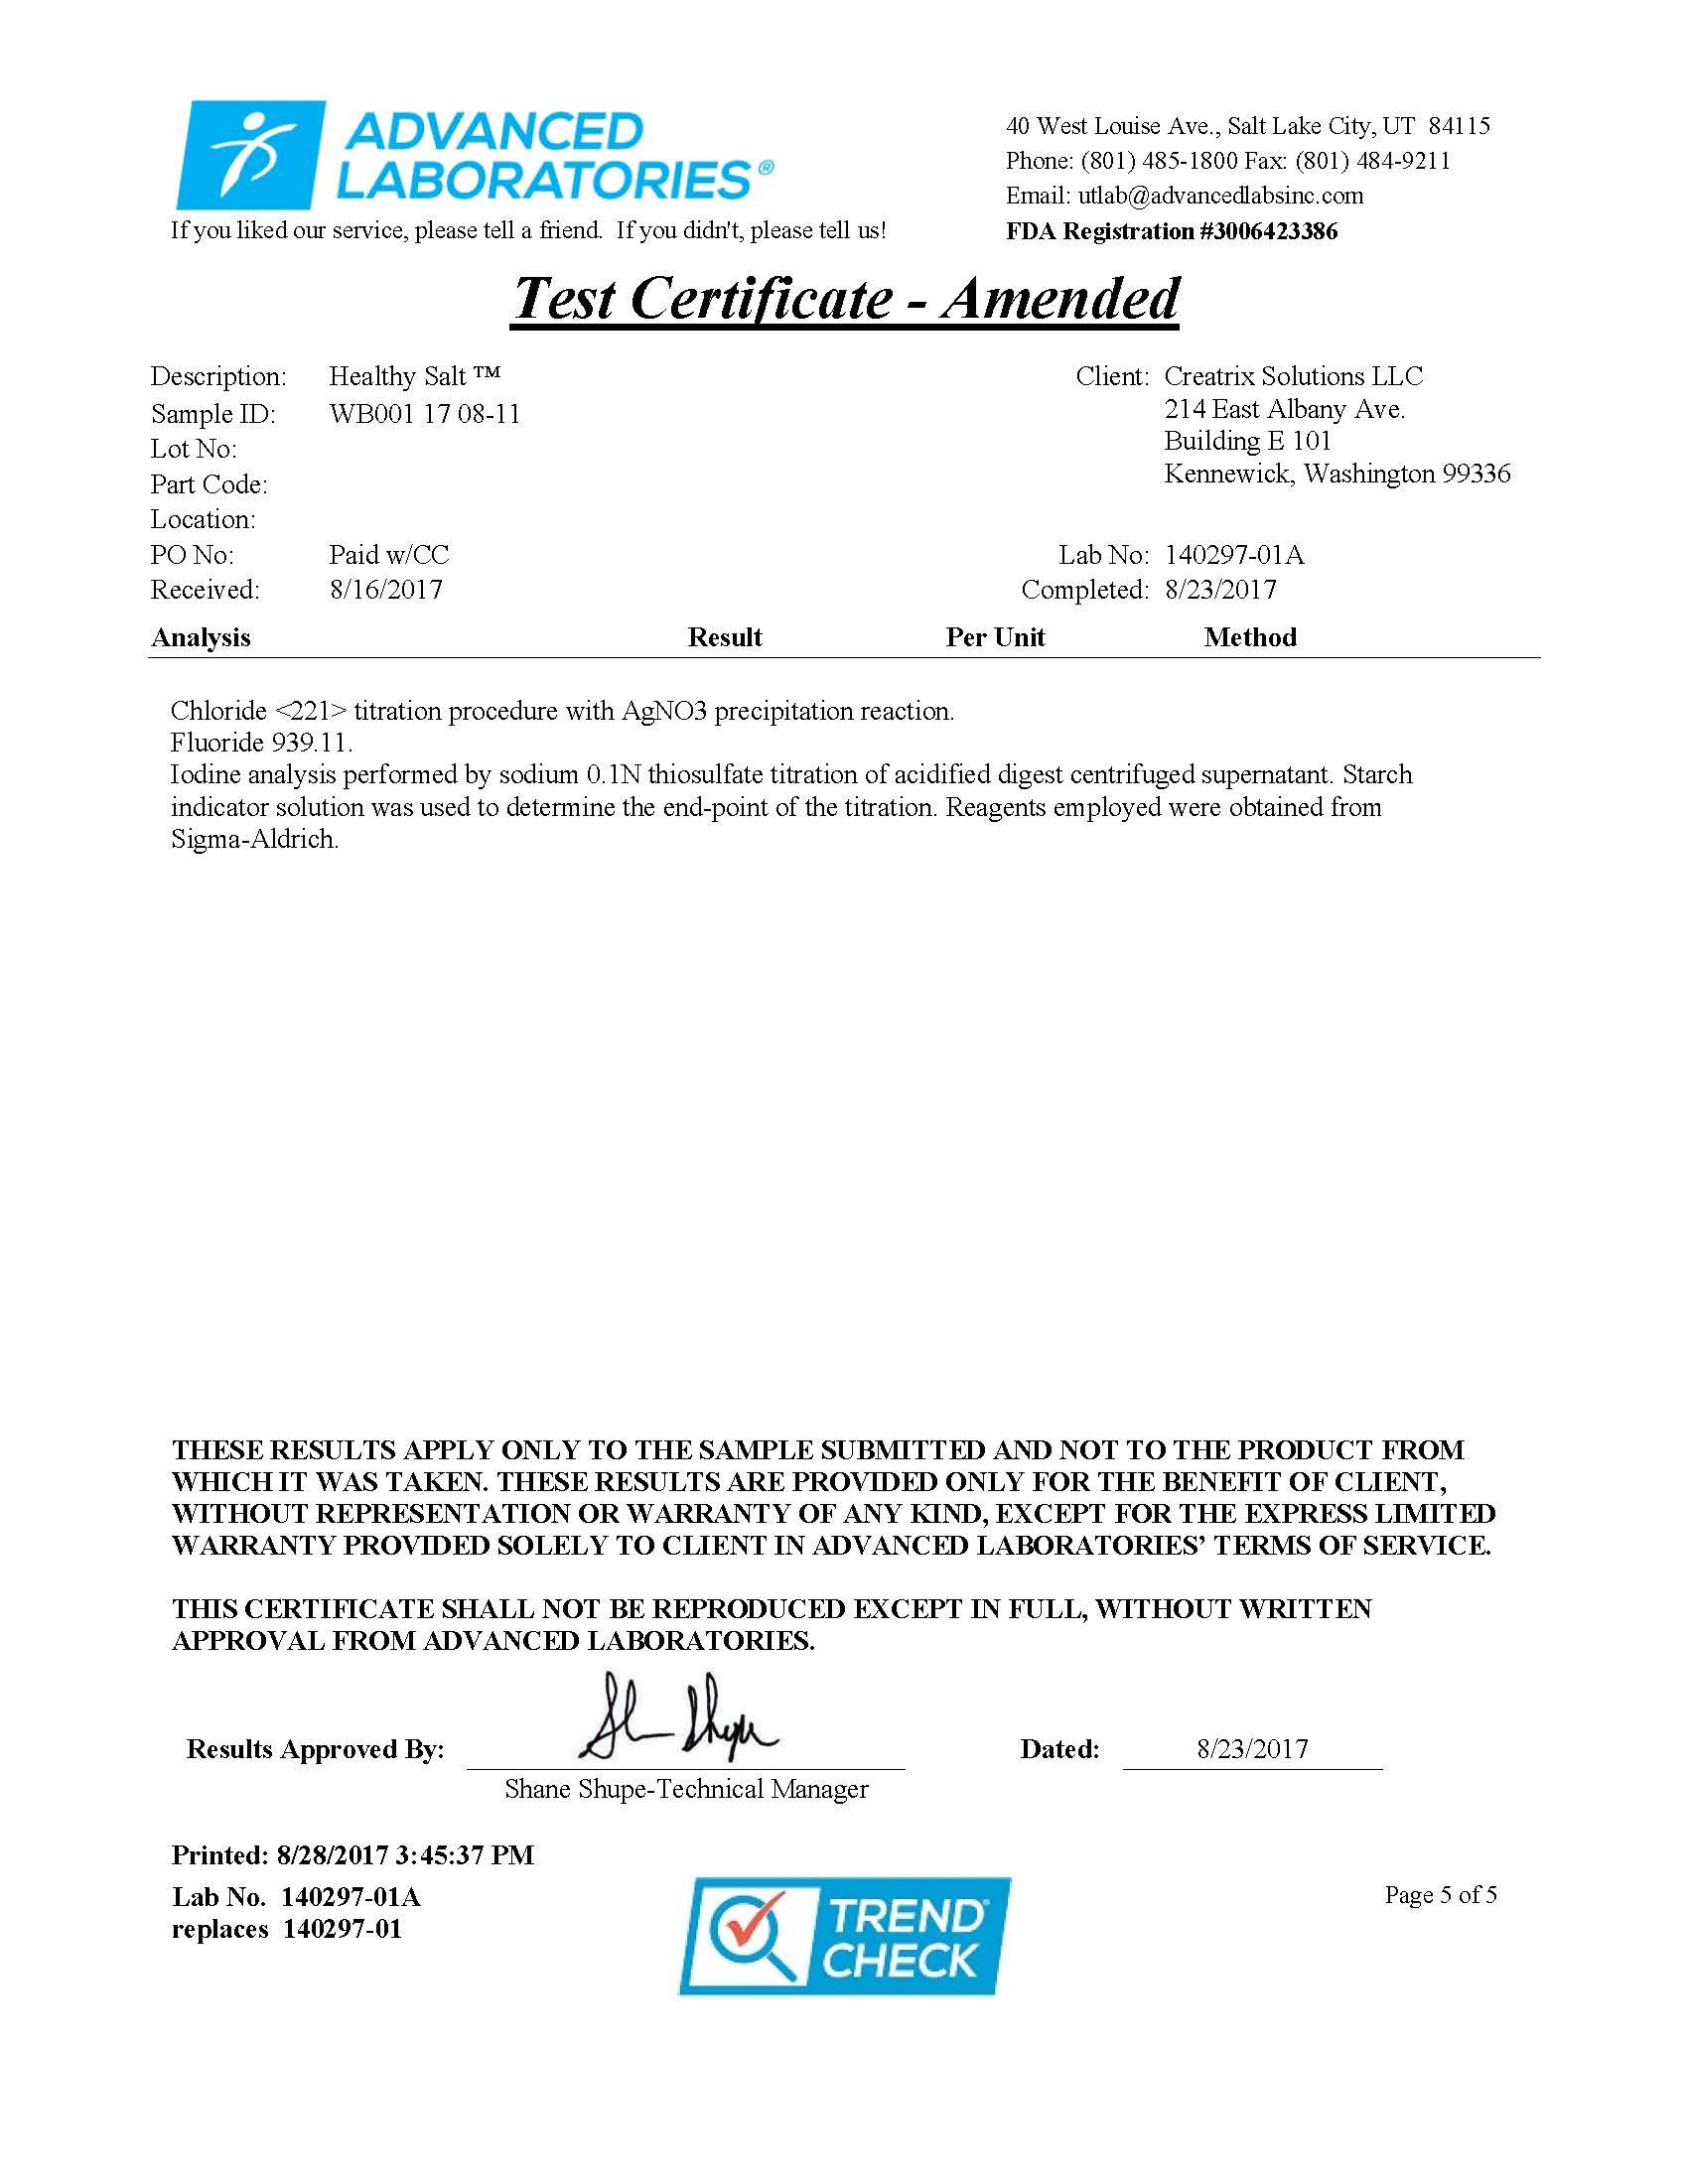 Healthy Salt Test Certificate